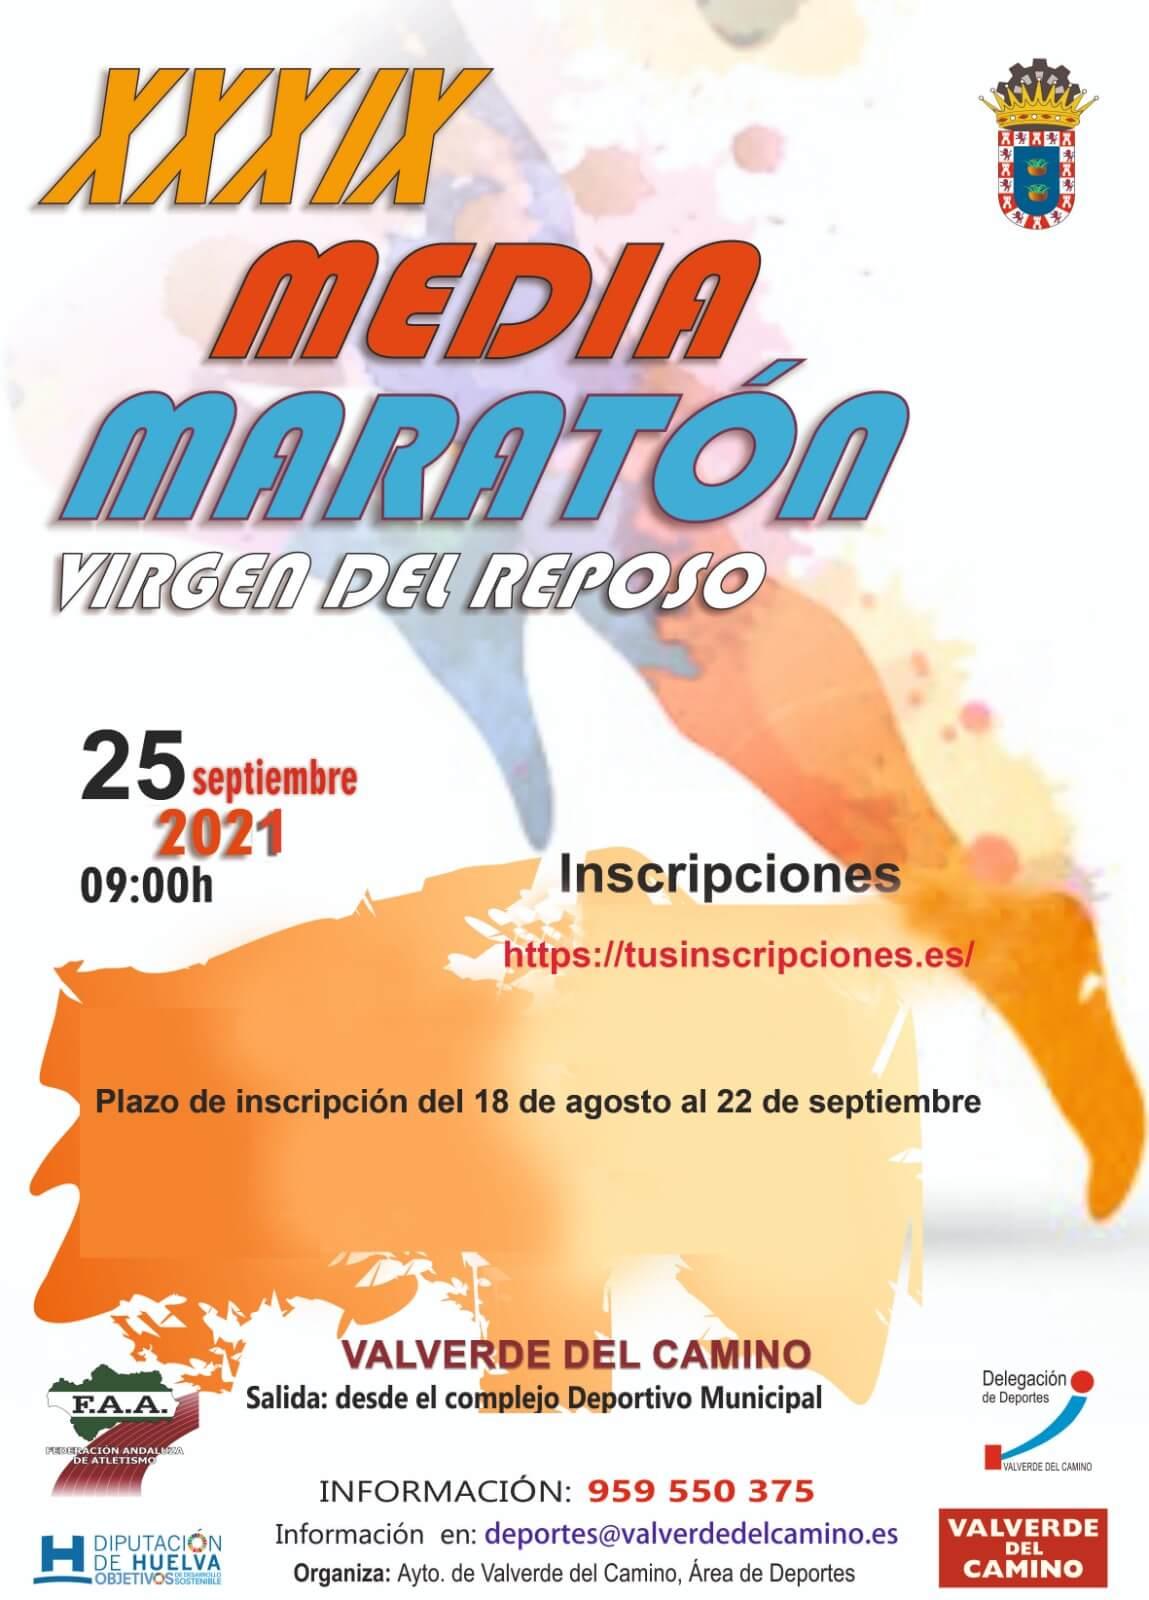 39 Media Maratón Virgen del Reposo